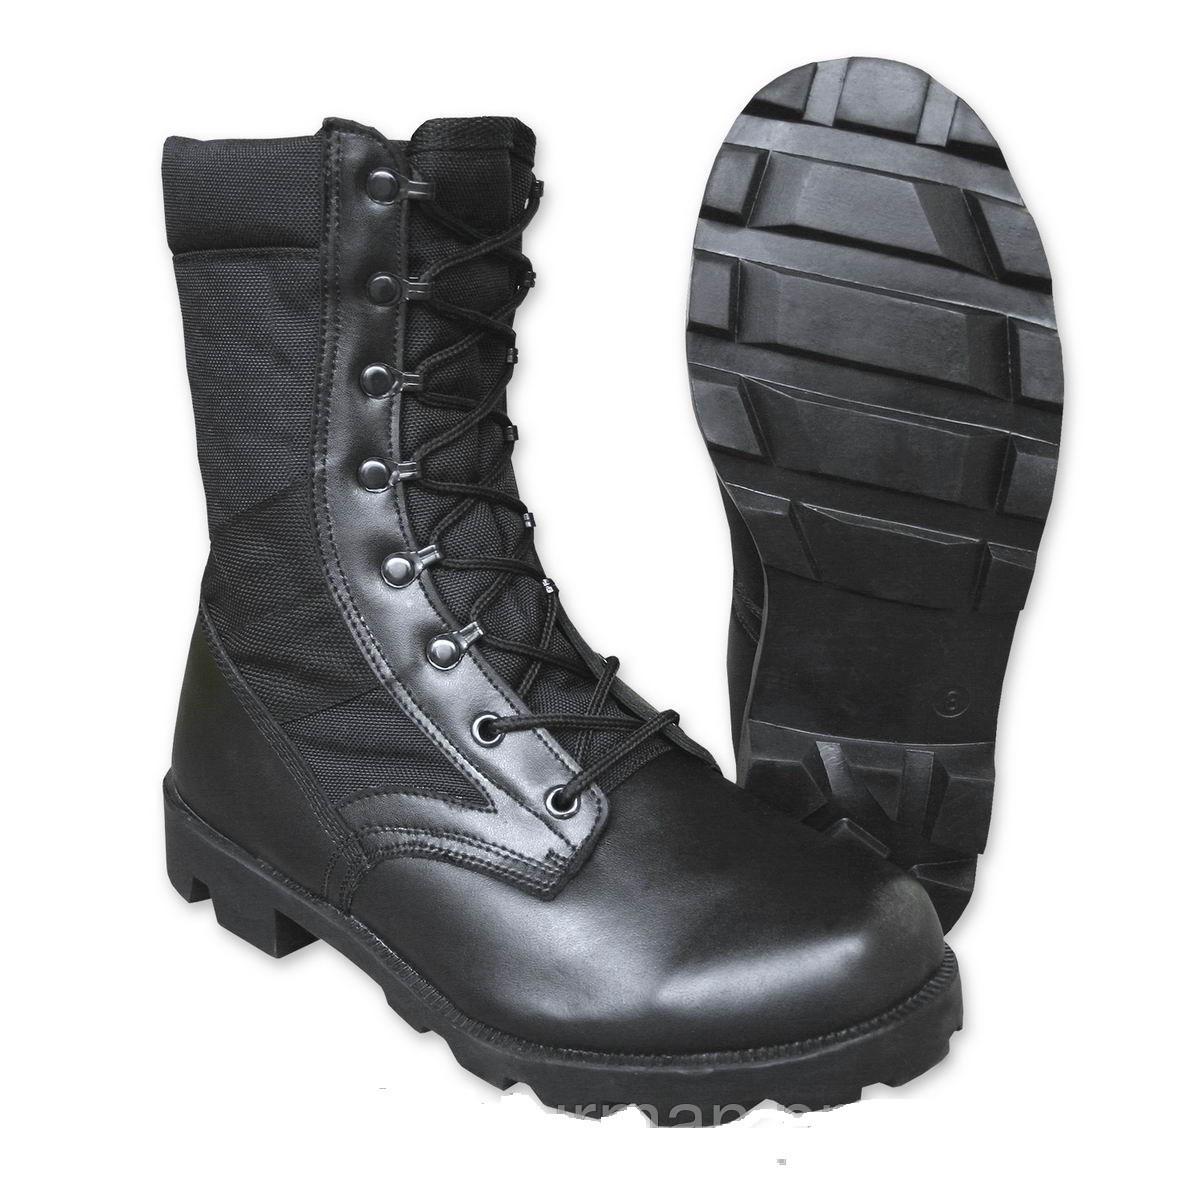 Летние армейские ботинки, берцы MilTec JUNGLE Cordura Black 12825002 4